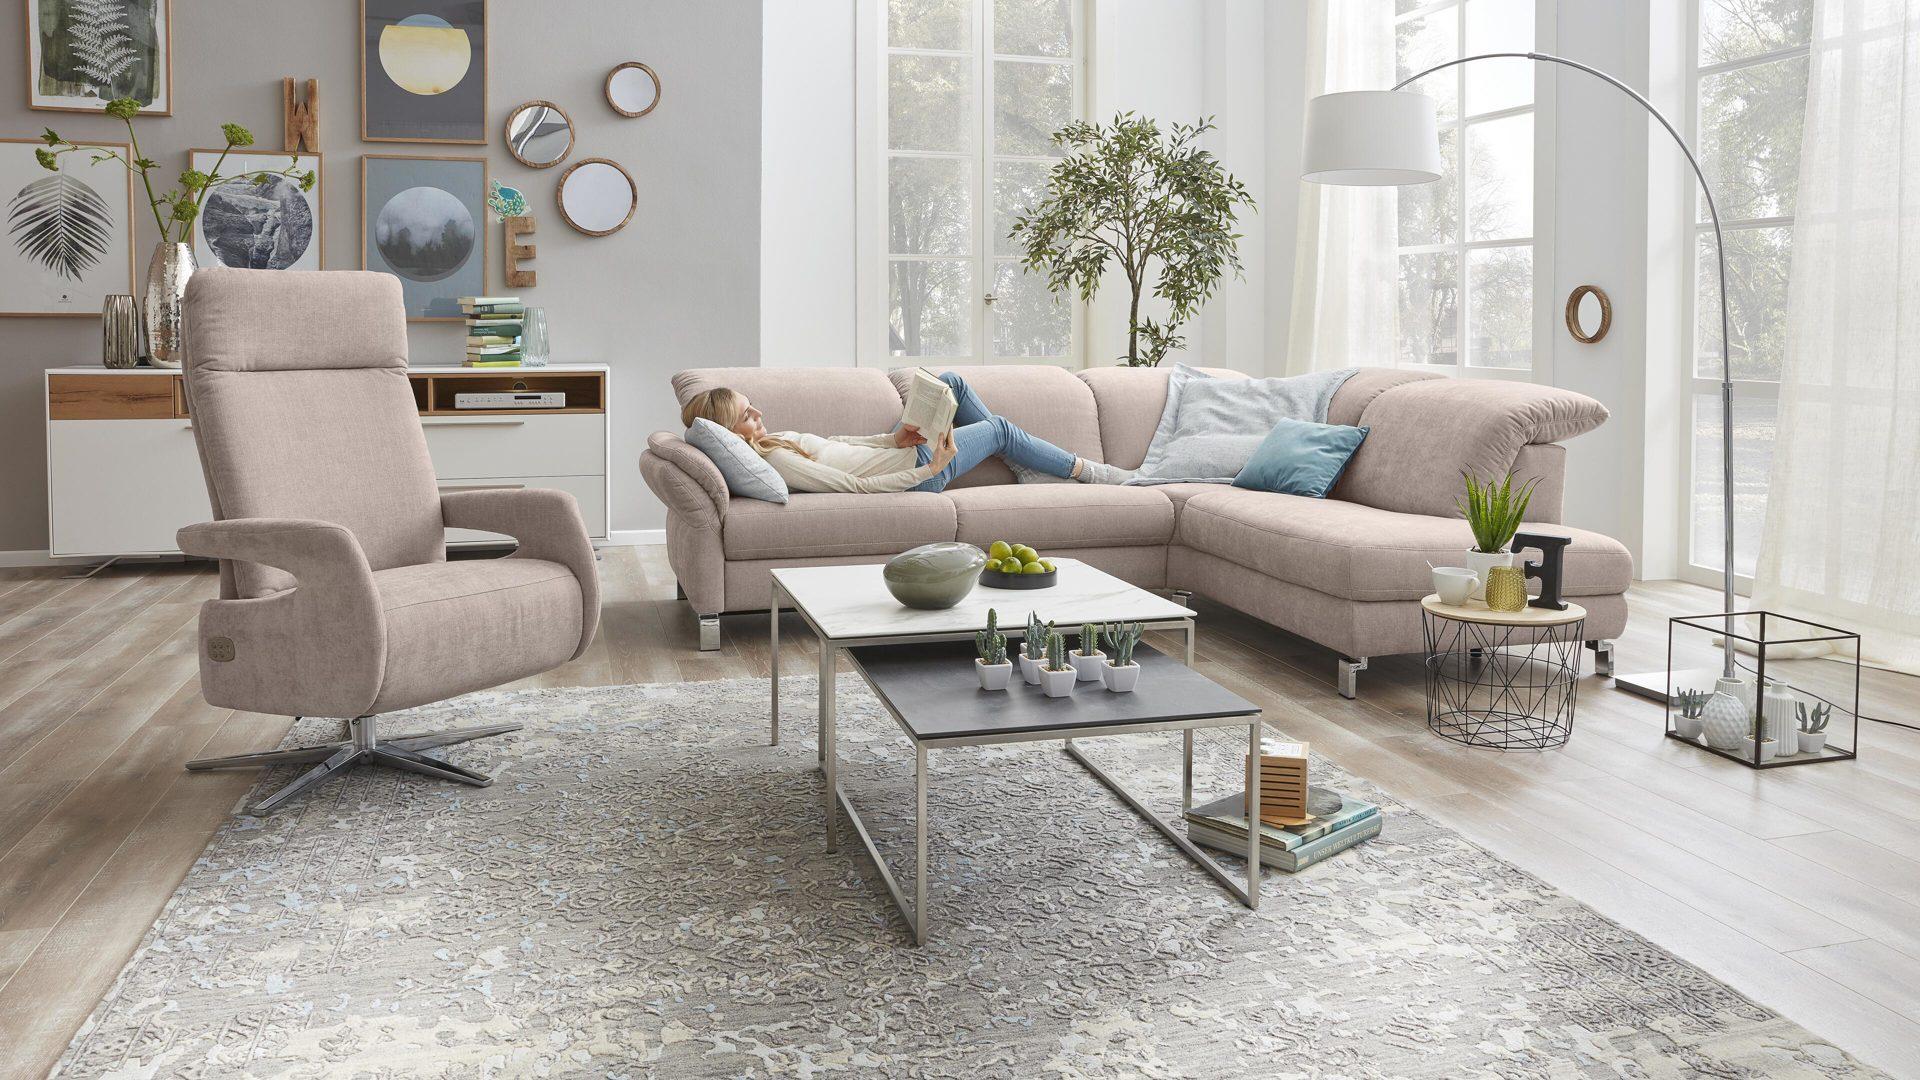 Interliving Sofa Serie 4101 Eckkombination Rosa Bezug Vintage